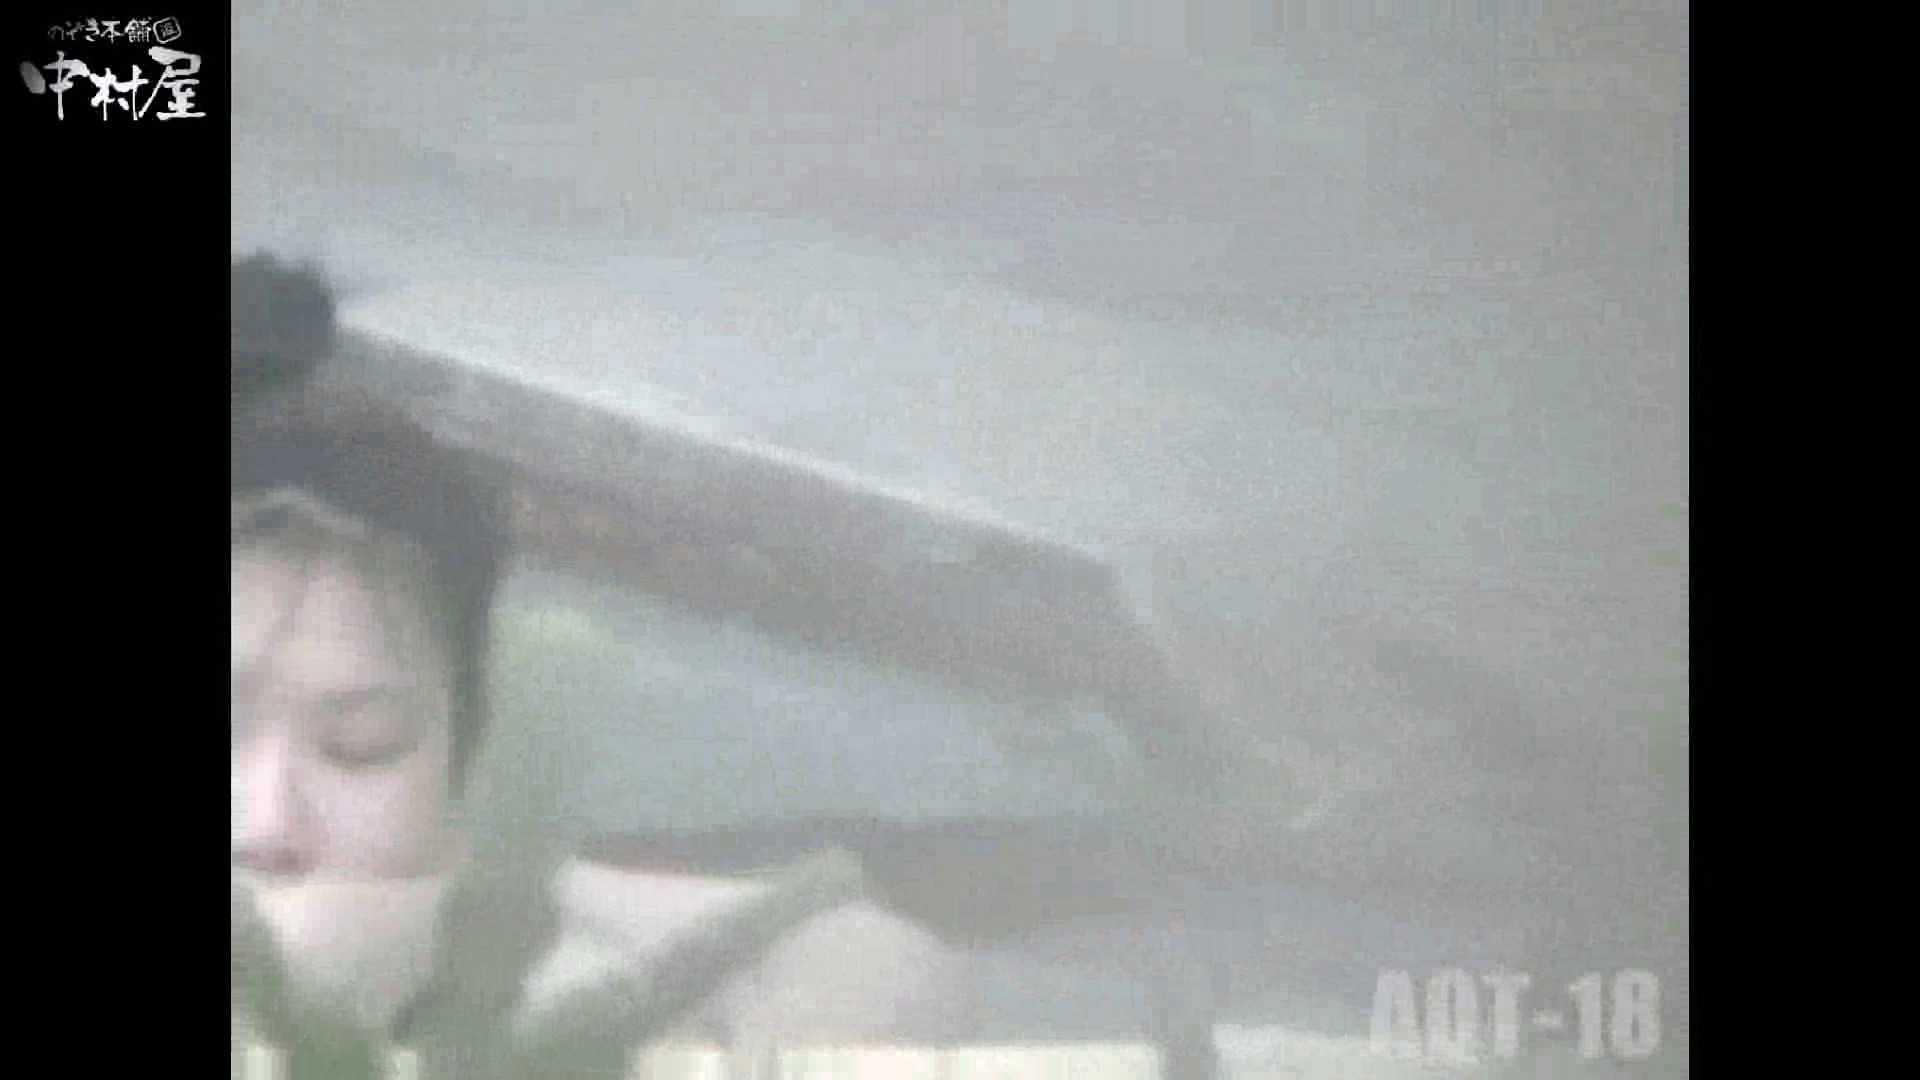 Aquaな露天風呂Vol.882潜入盗撮露天風呂十八判湯 其の二 盗撮 隠し撮りオマンコ動画紹介 39連発 11